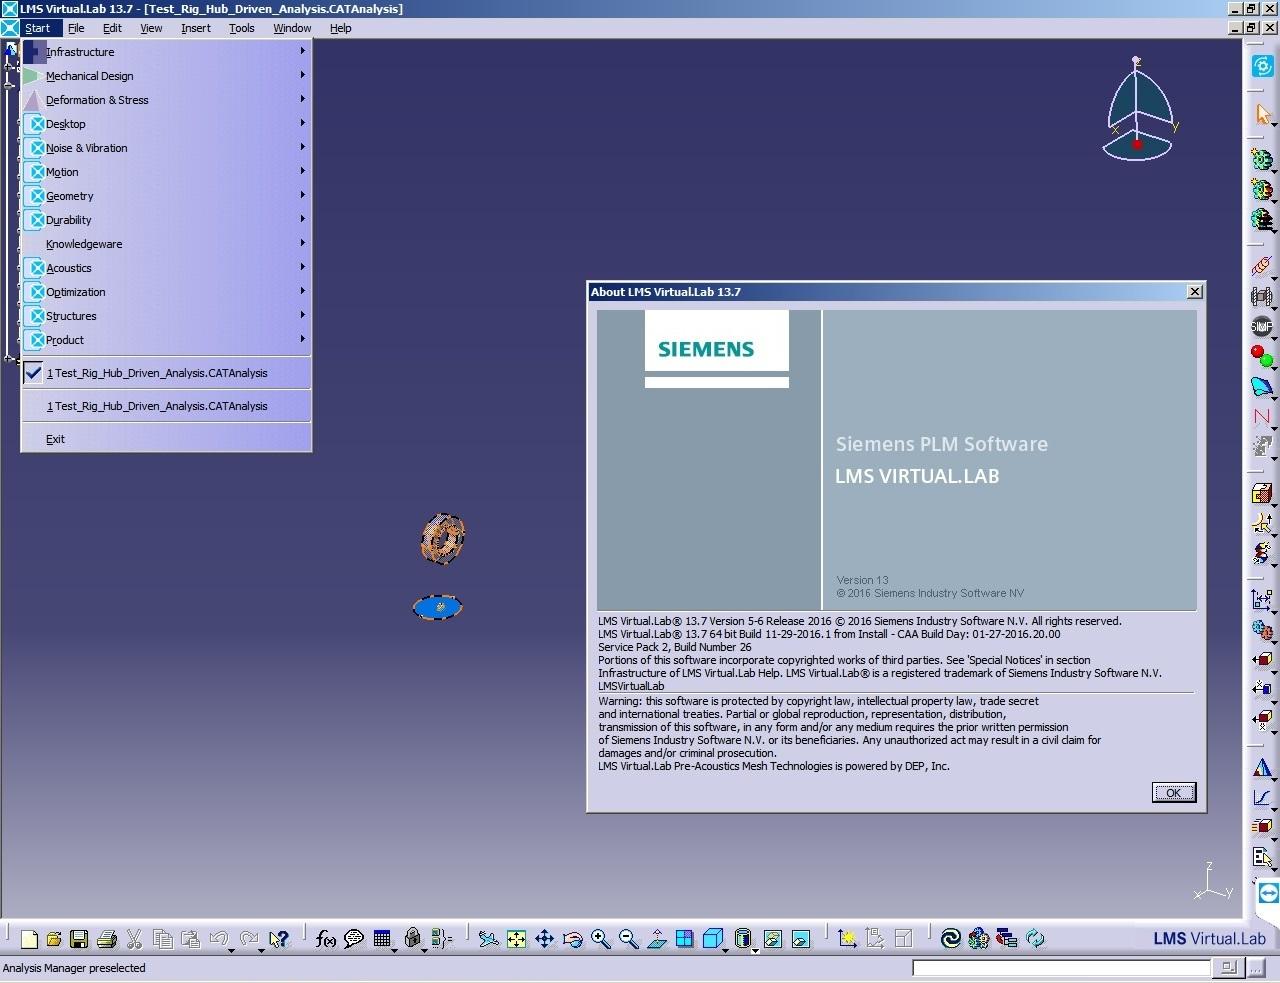 Working with Siemens LMS Virtual.Lab Rev 13.7 64bit full